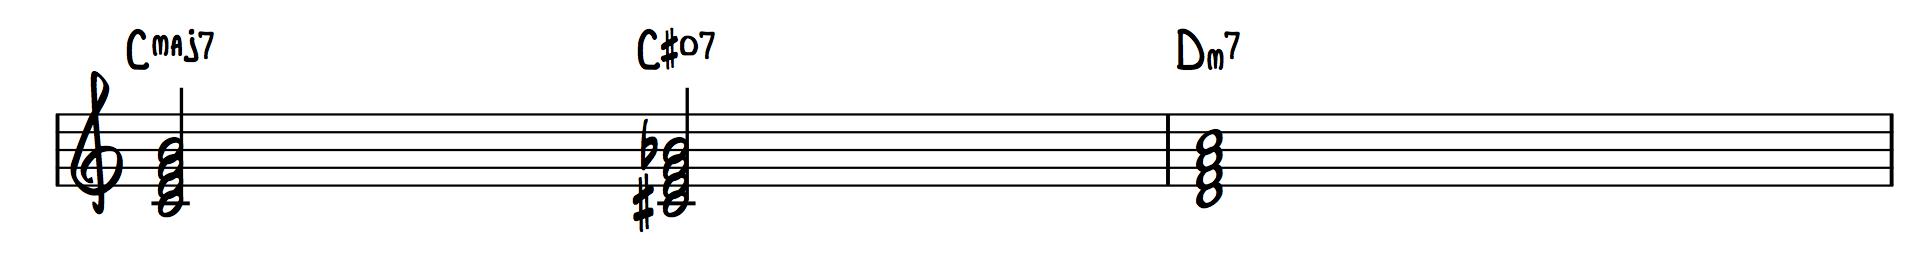 make-harmonies-interesting